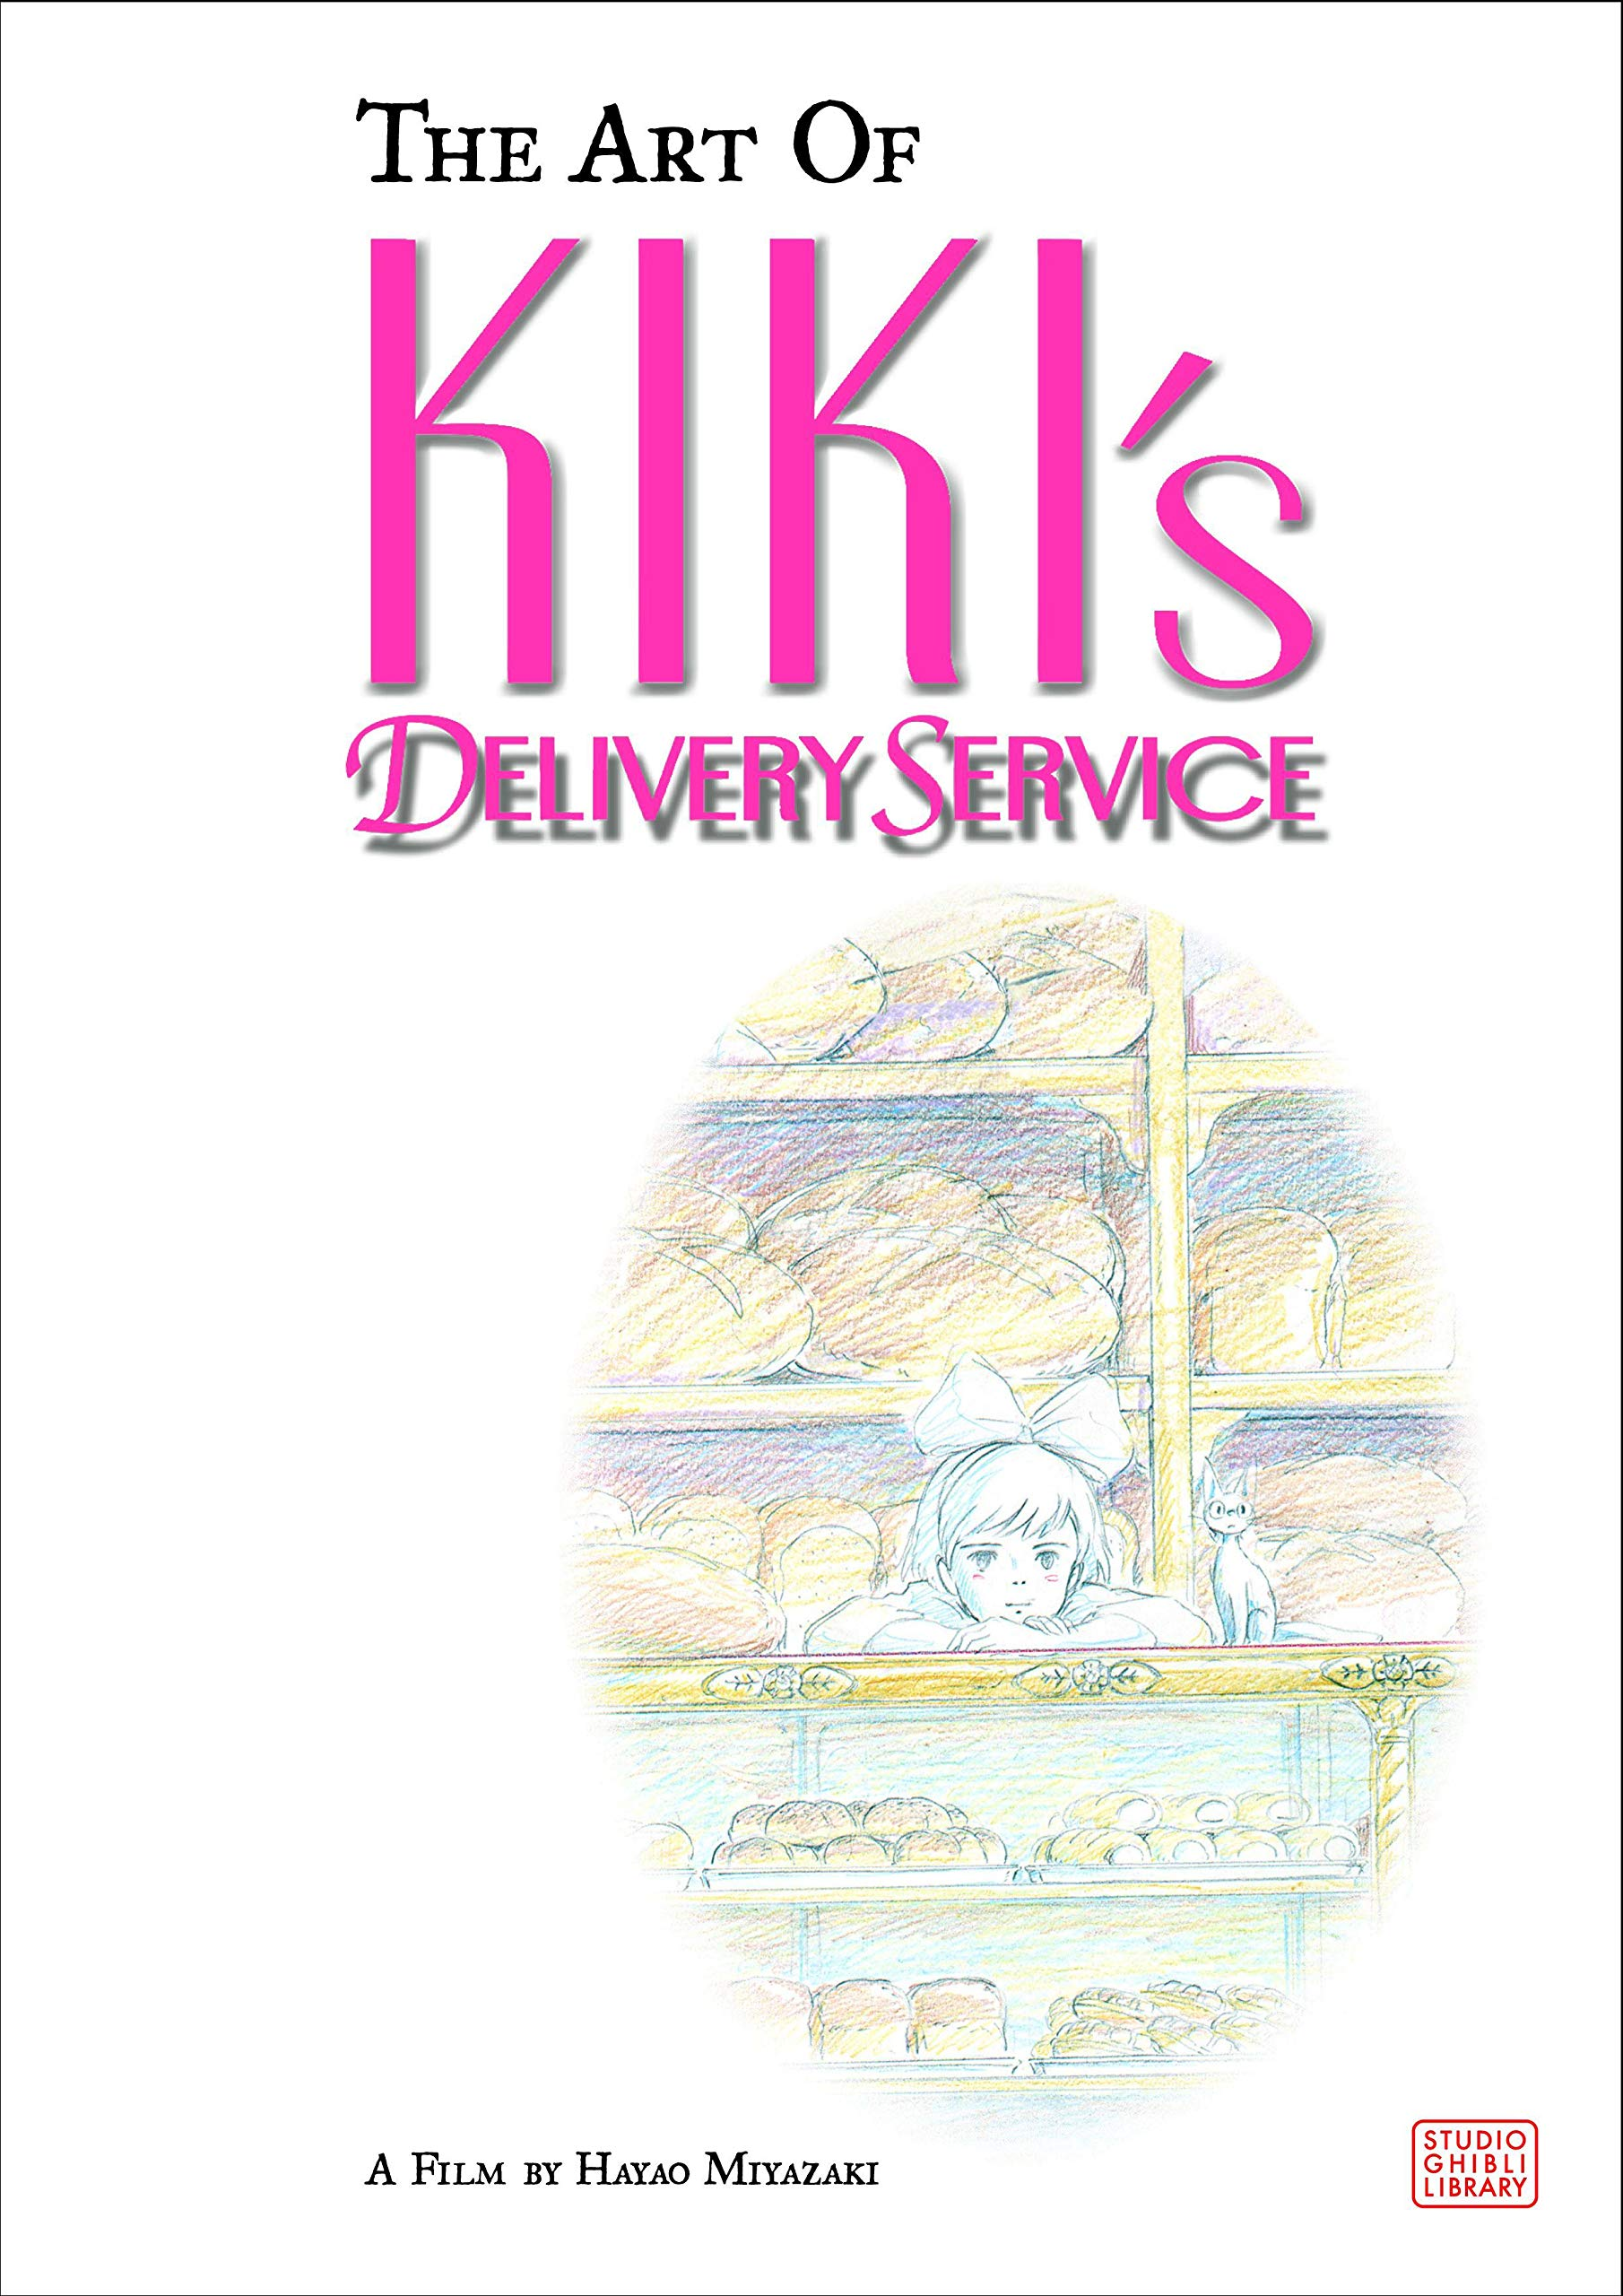 The Art of Kiki's Delivery Service: A Film by Hayao Miyazaki